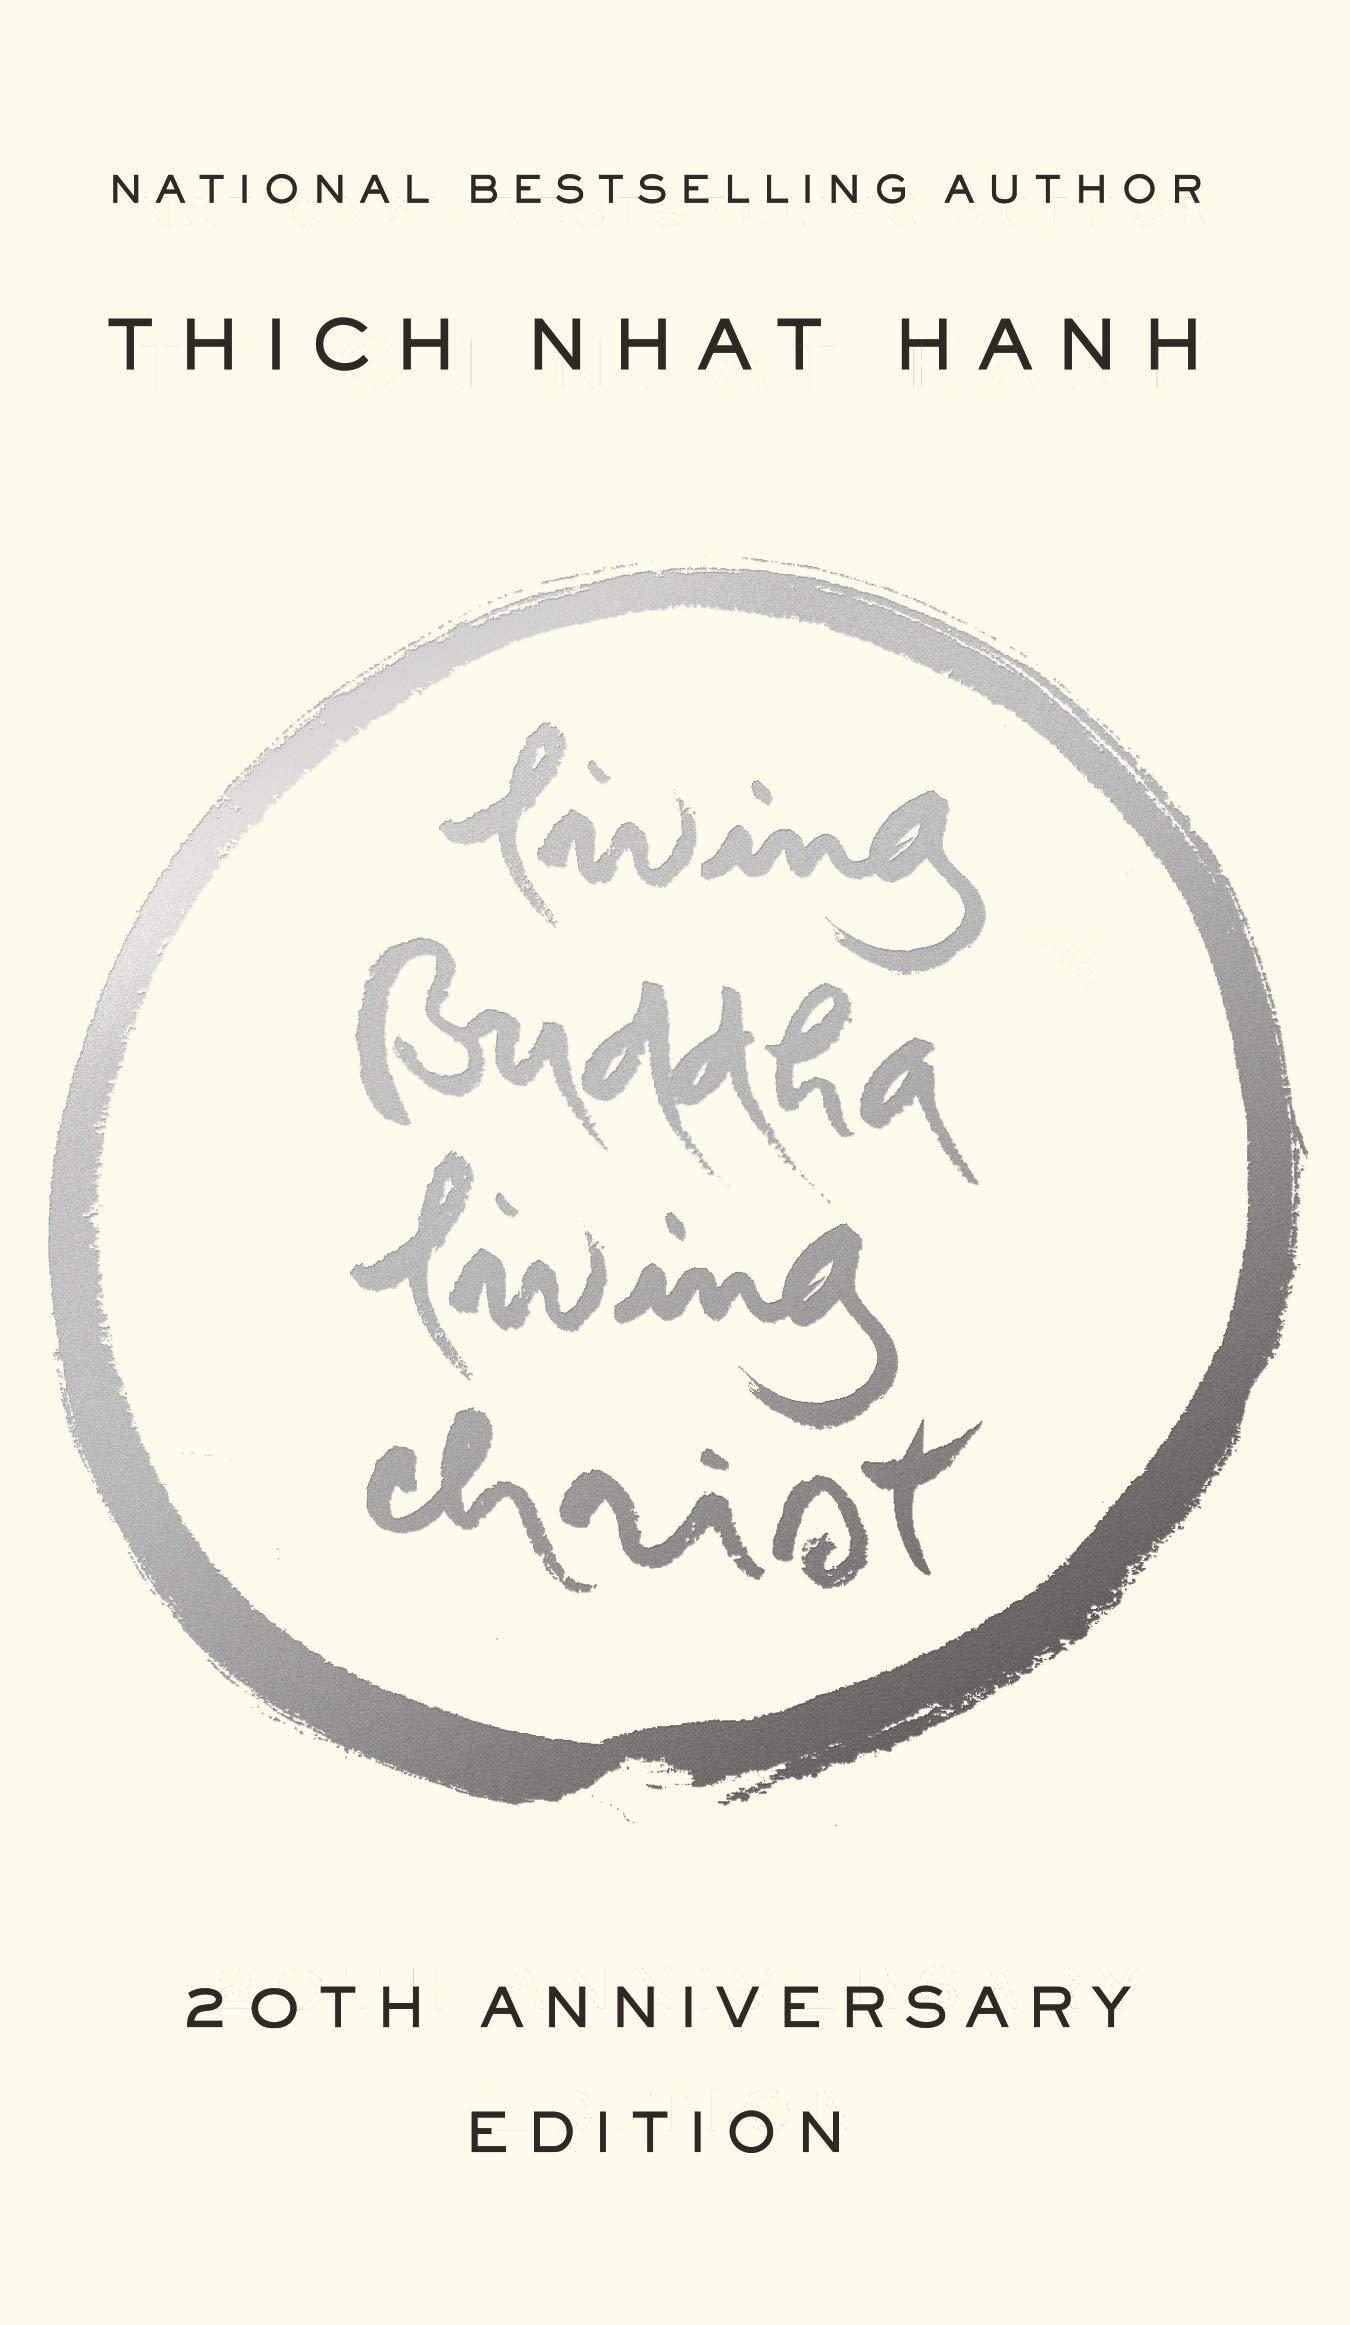 Living Buddha, Living Christ: 20th Anniversary Edition: Hanh, Thich Nhat, Pagels, Elaine: 9781594482397: Amazon.com: Books